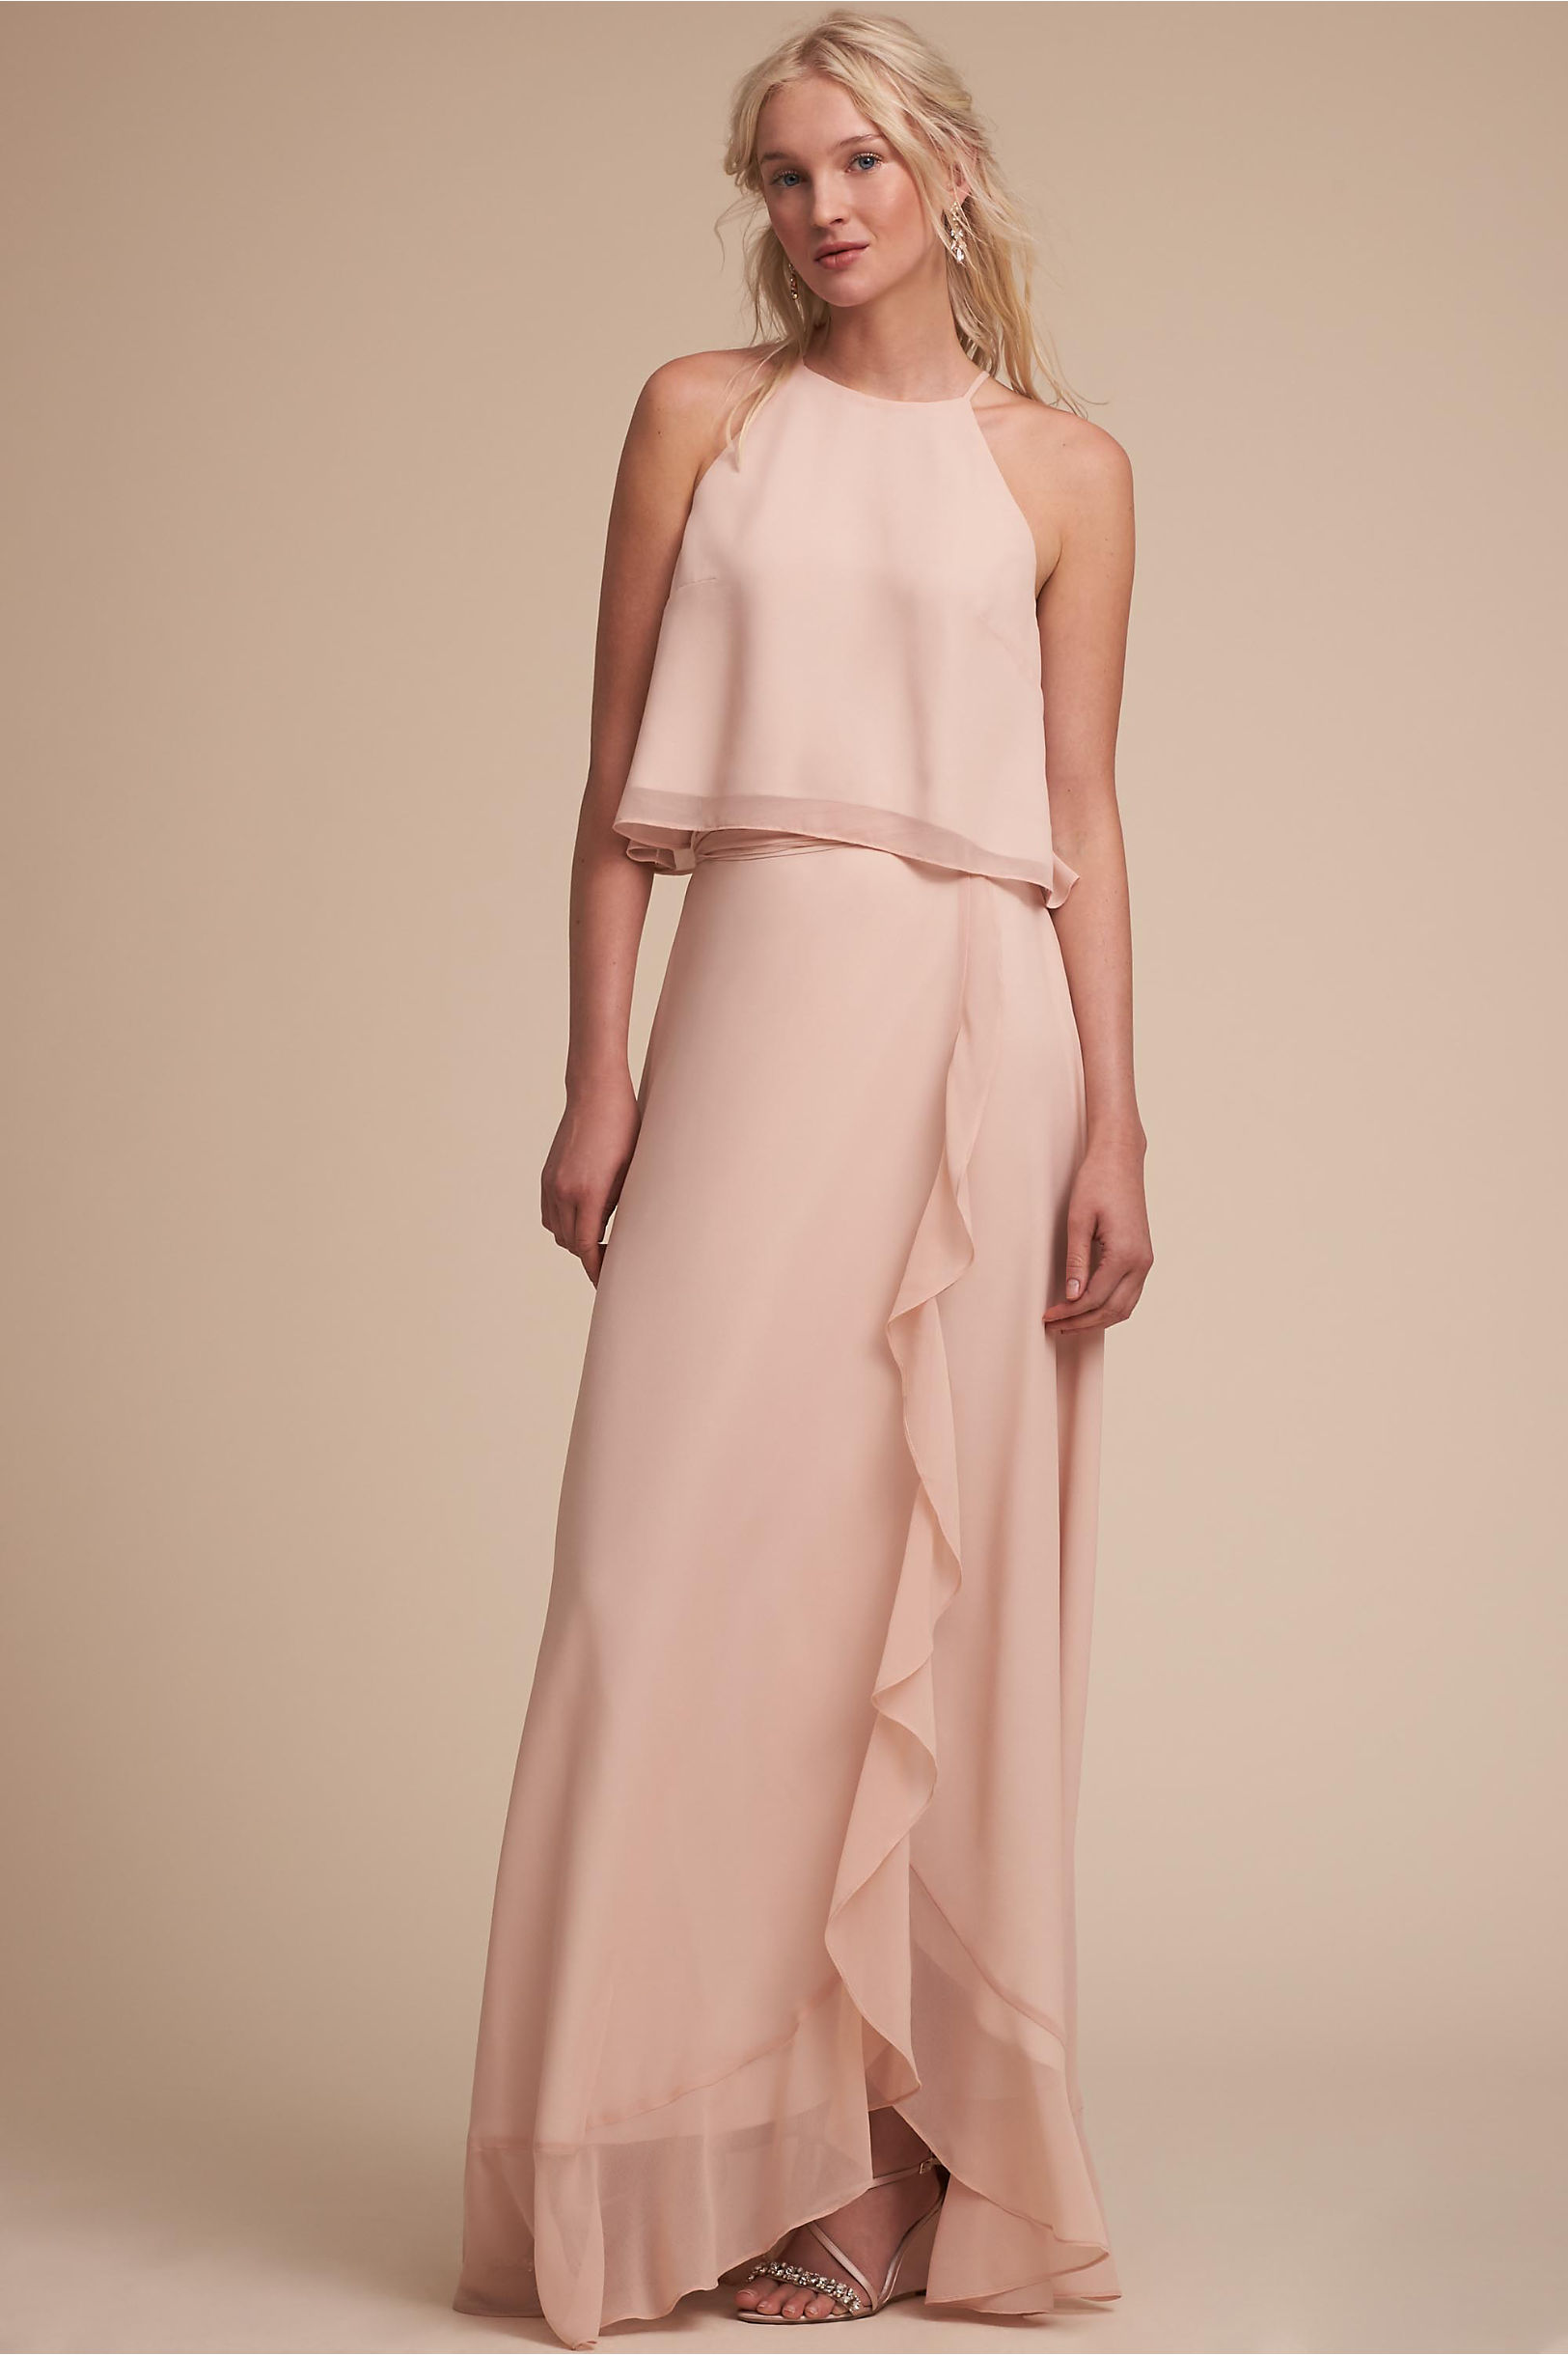 Two piece bridesmaid dresses separates bhldn etoile top skirt ombrellifo Images